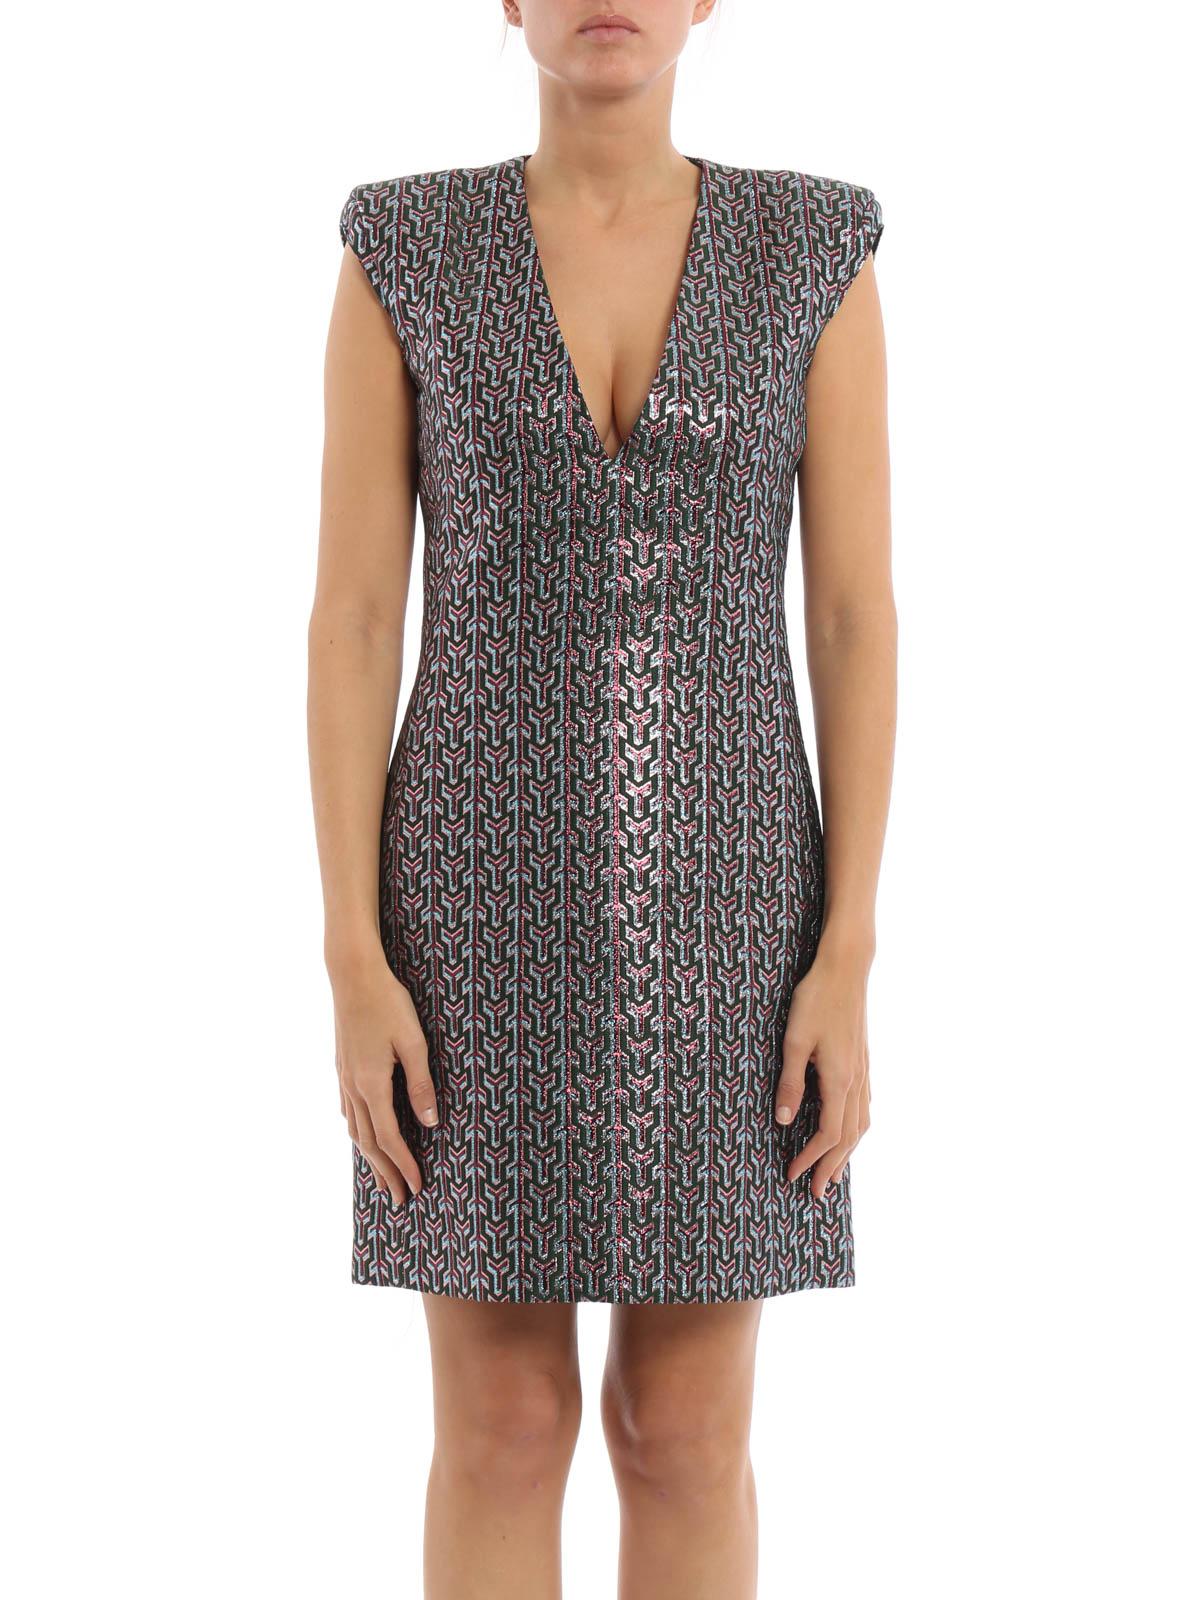 Tara Jarmon Cocktail Dresses